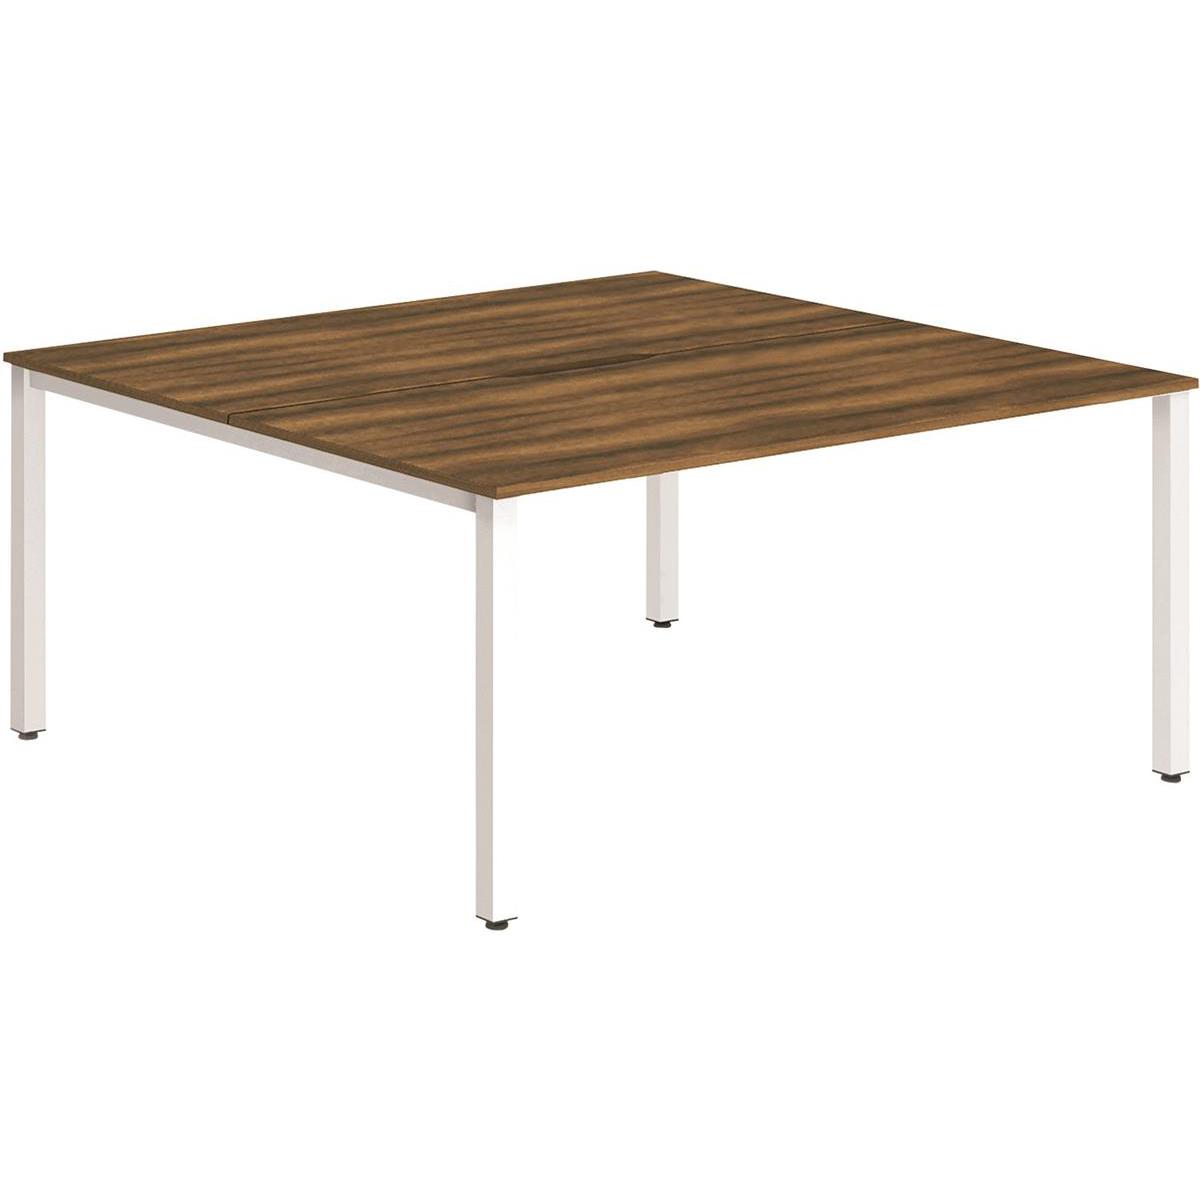 Trexus Bench Desk 2 Person Back to Back Configuration White Leg 1600x1600mm Walnut Ref BE149